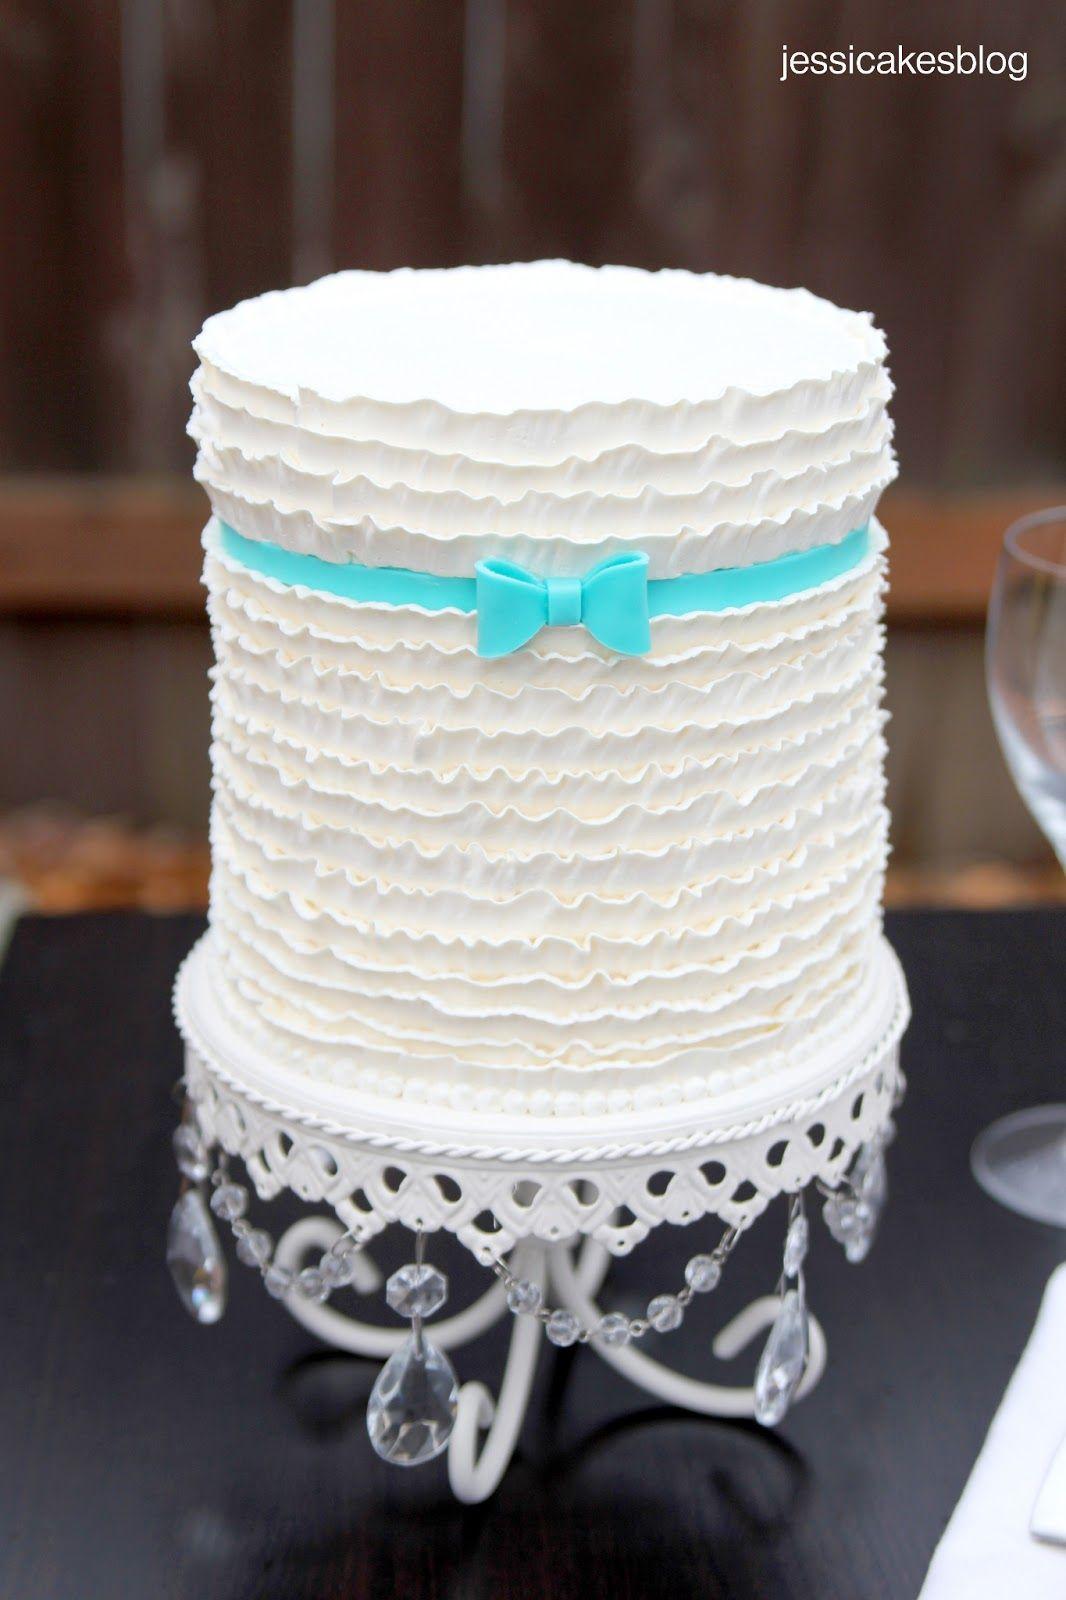 Jessicakes: Buttercream Frills (or Ruffles) Cake.